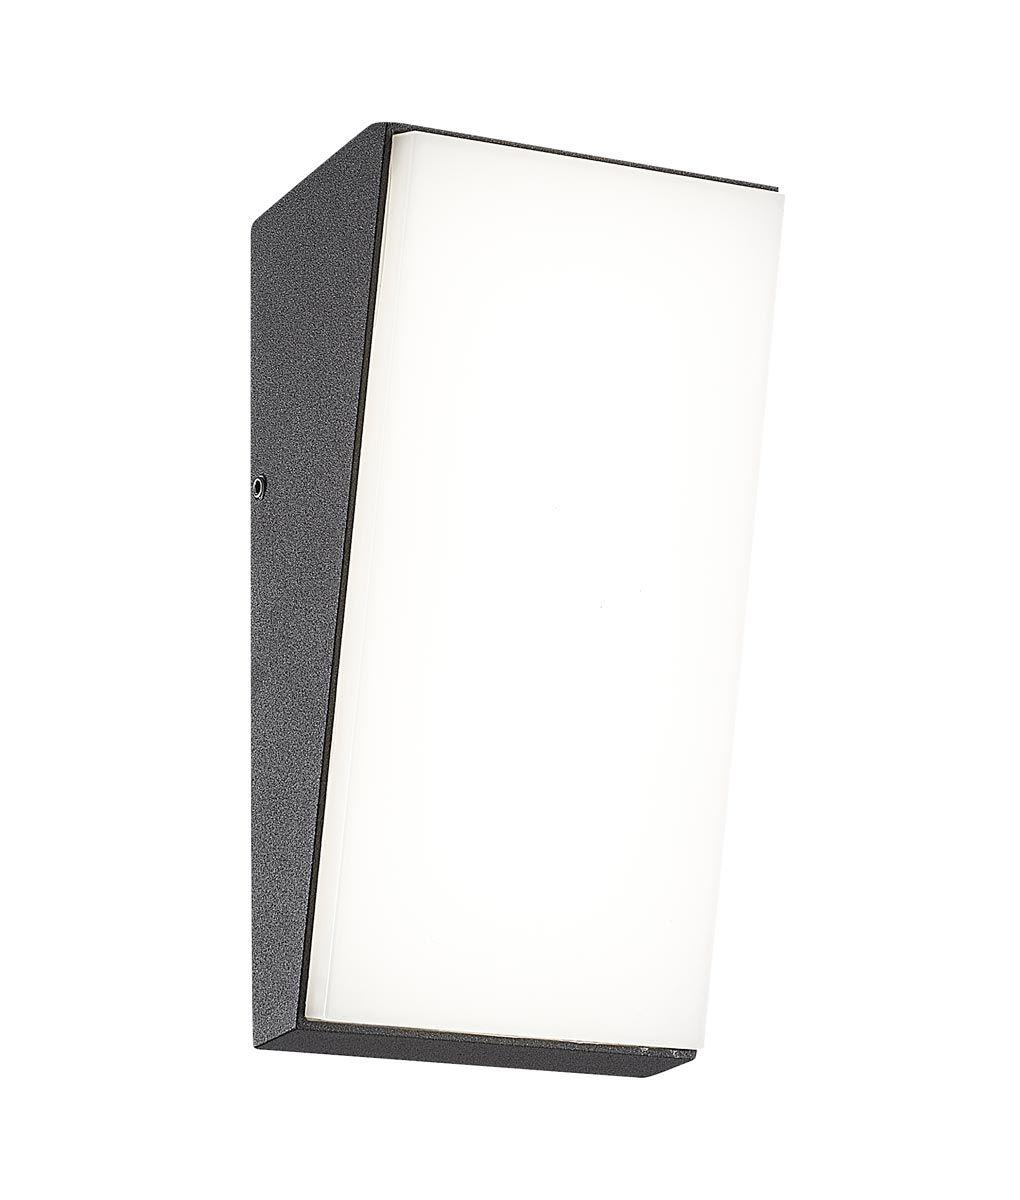 Aplique exterior gris oscuro 9W SOLDEN LED